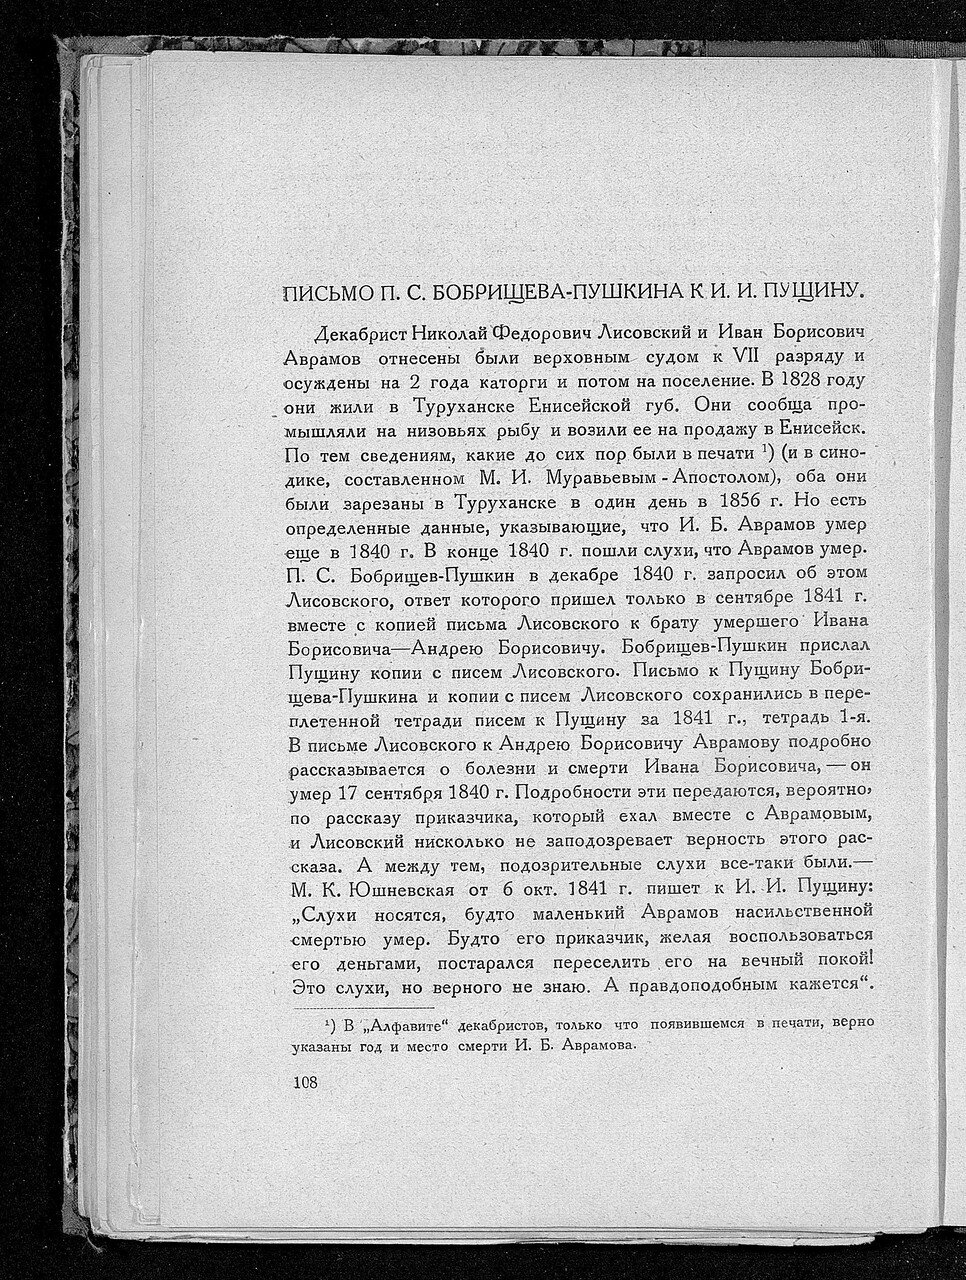 https://img-fotki.yandex.ru/get/477594/199368979.a2/0_214367_d4ffdbfc_XXXL.jpg